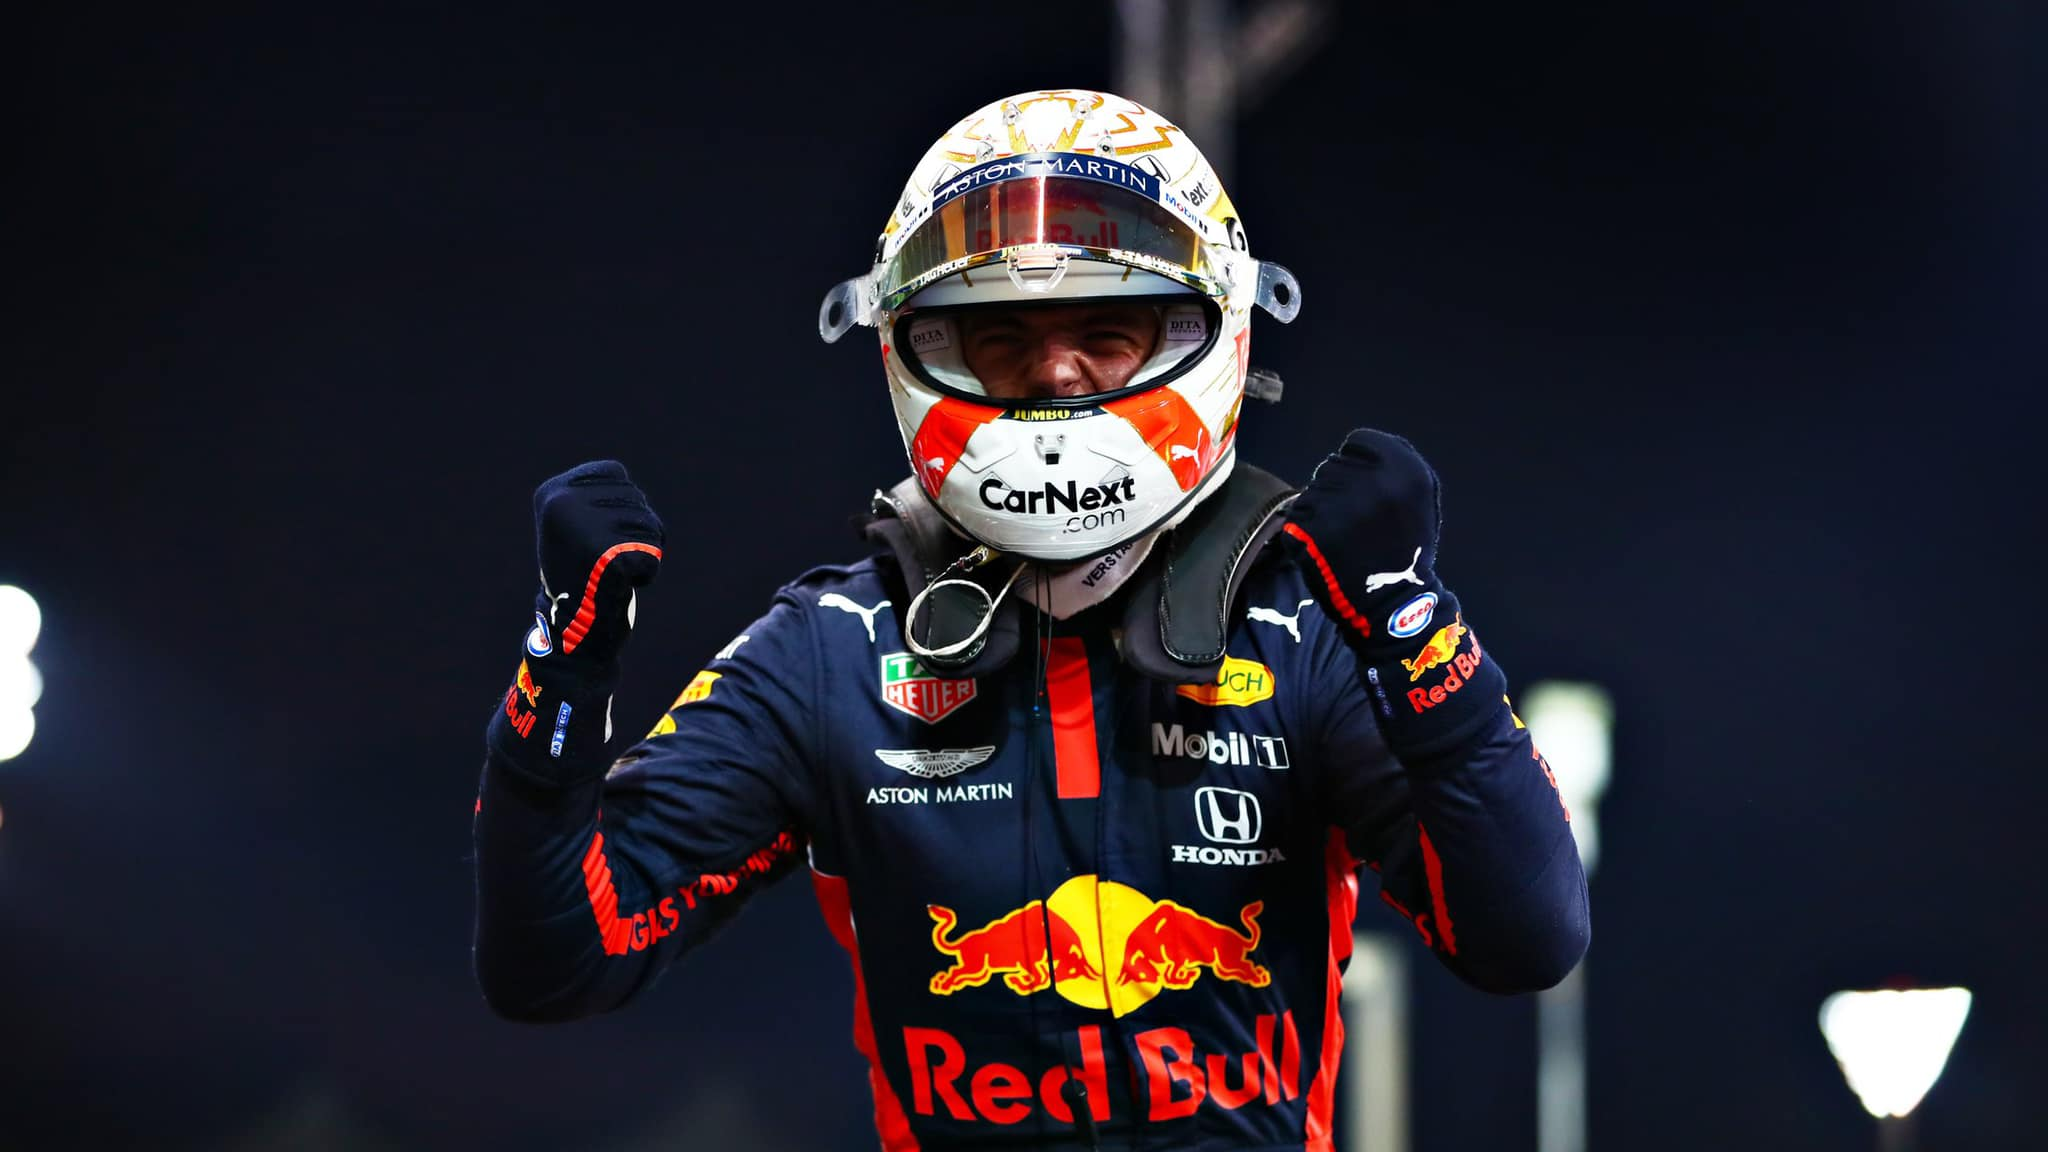 F1, GP Abu Dhabi 2020: Verstappen vince l'ultima gara dell'anno